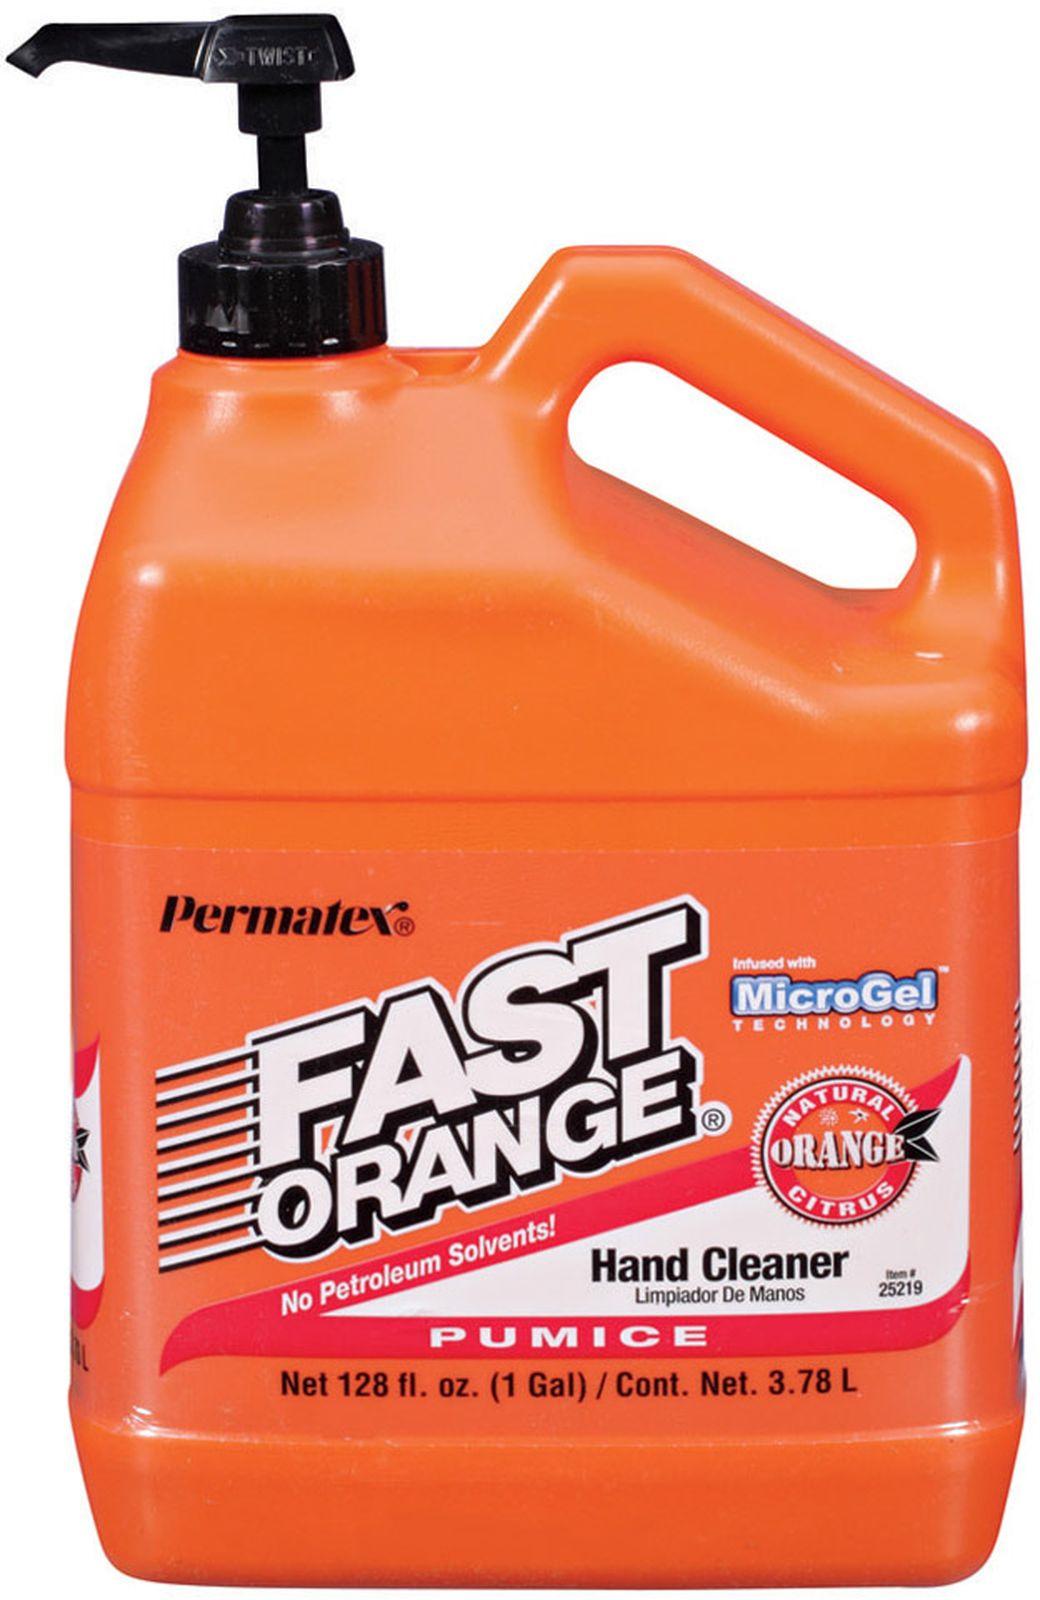 Средство для очистки рук Permatex Фаст Оранж, с пемзой, 3,78 л